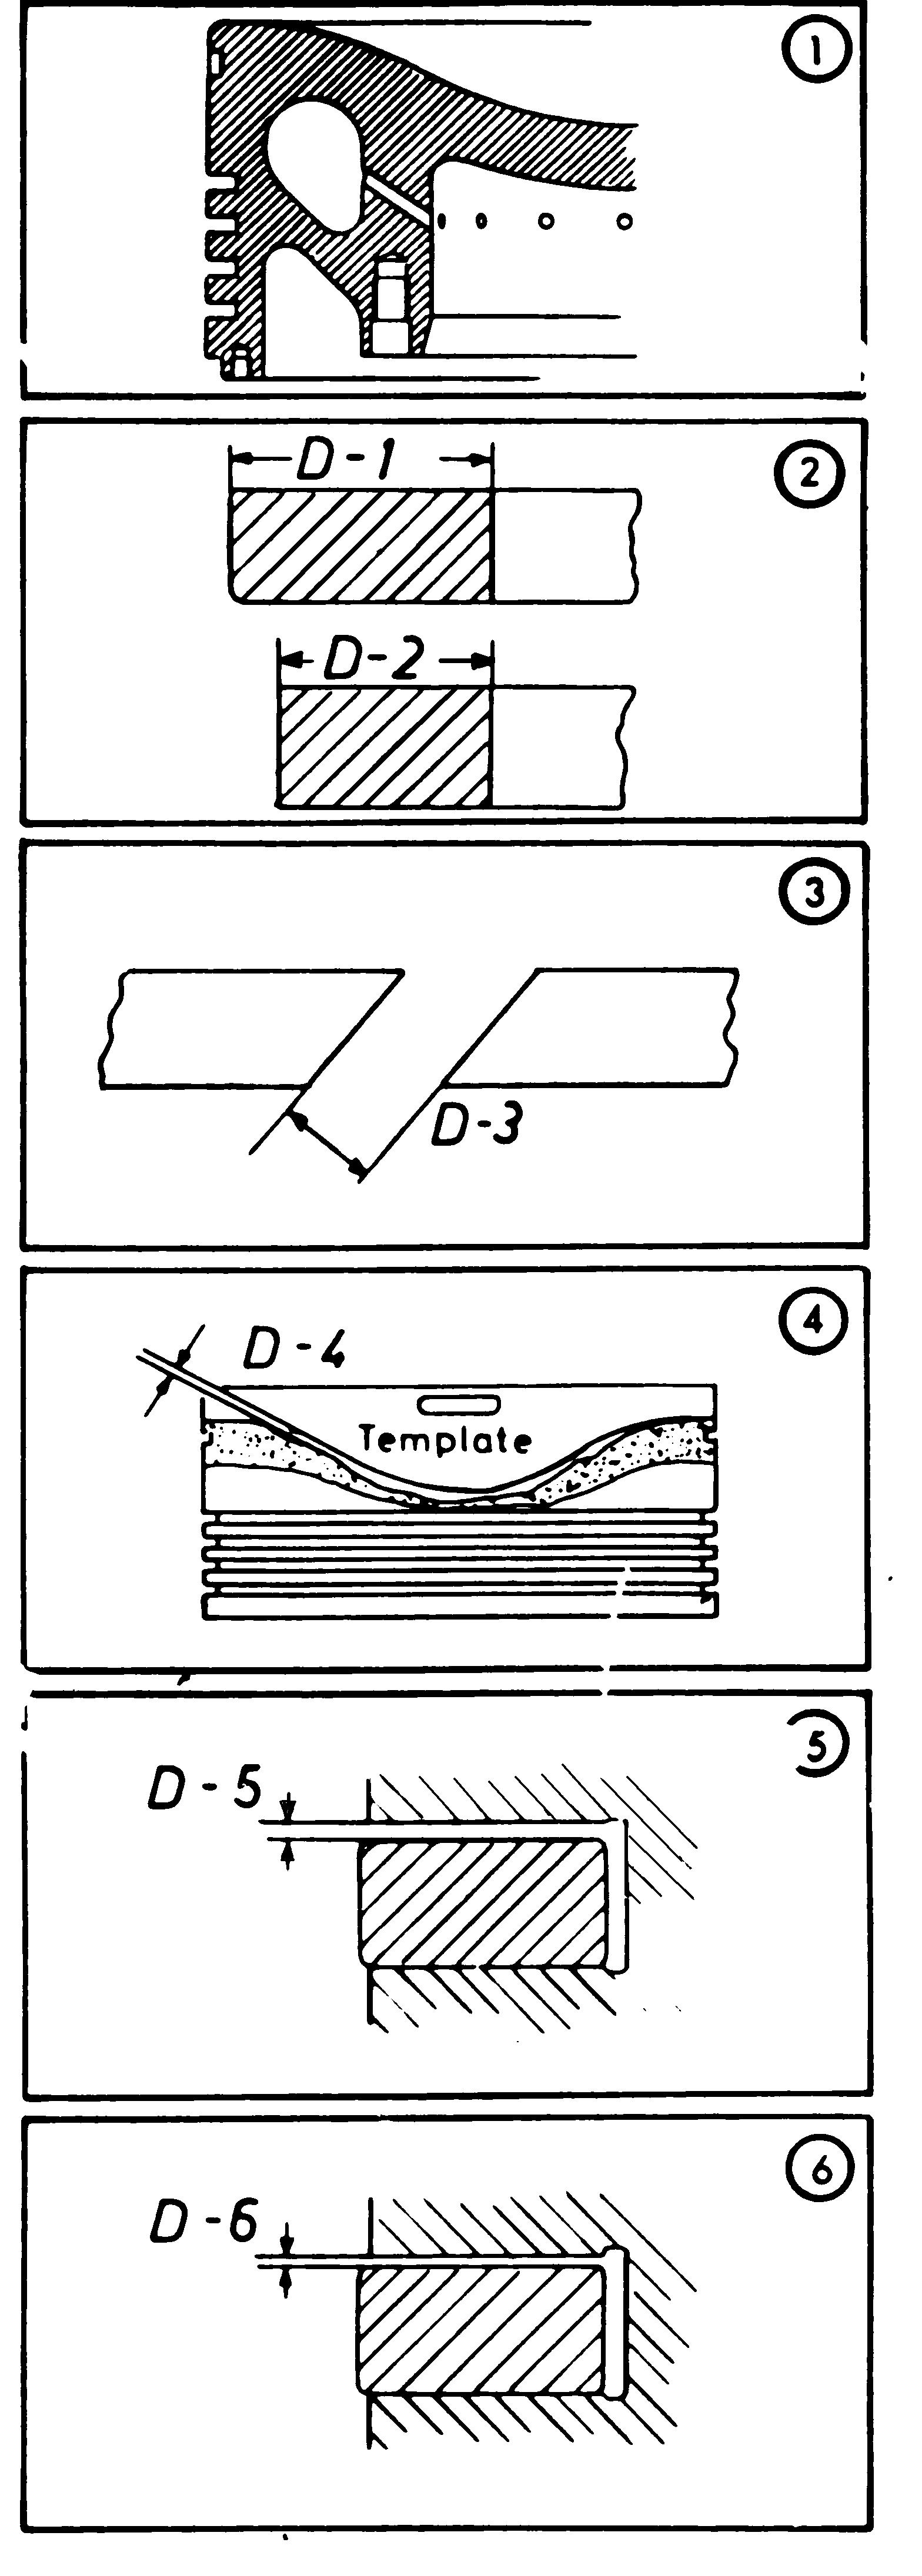 image210.png